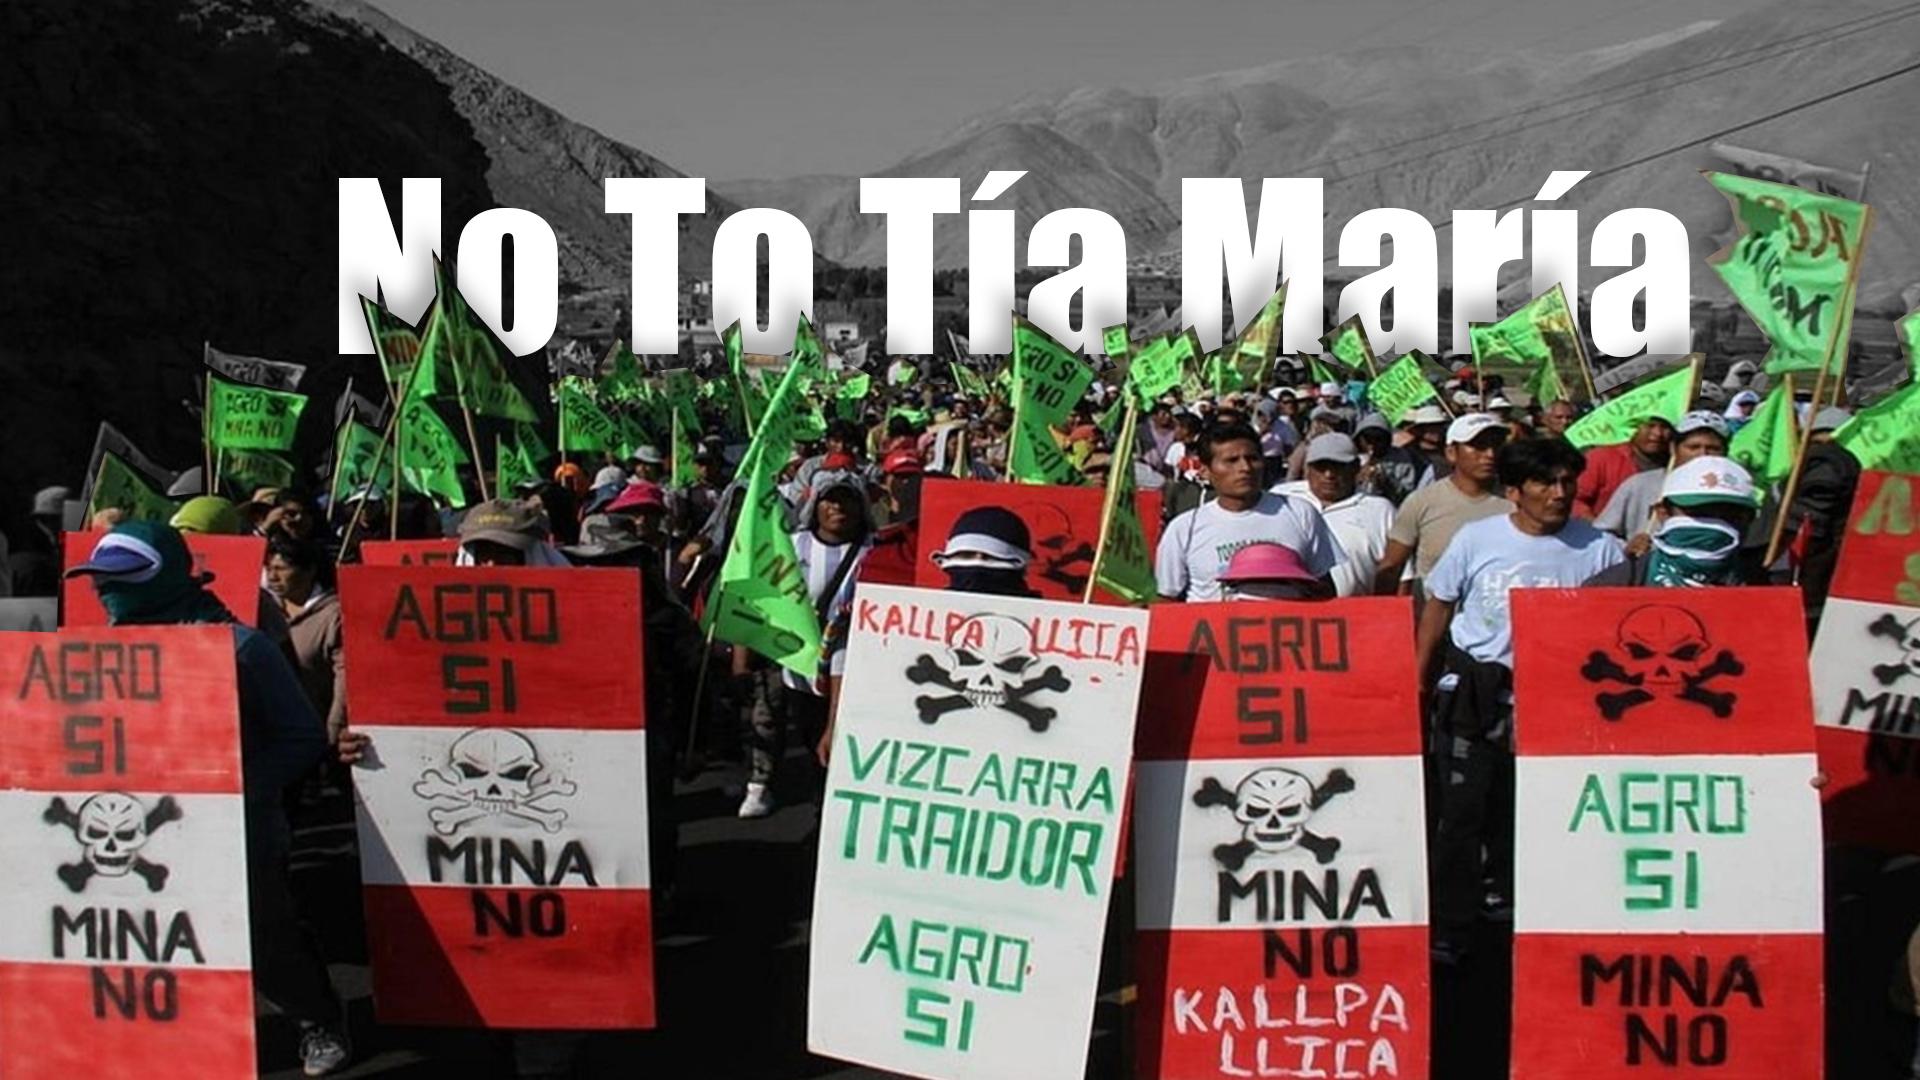 No to Tia Matia Peru Mine